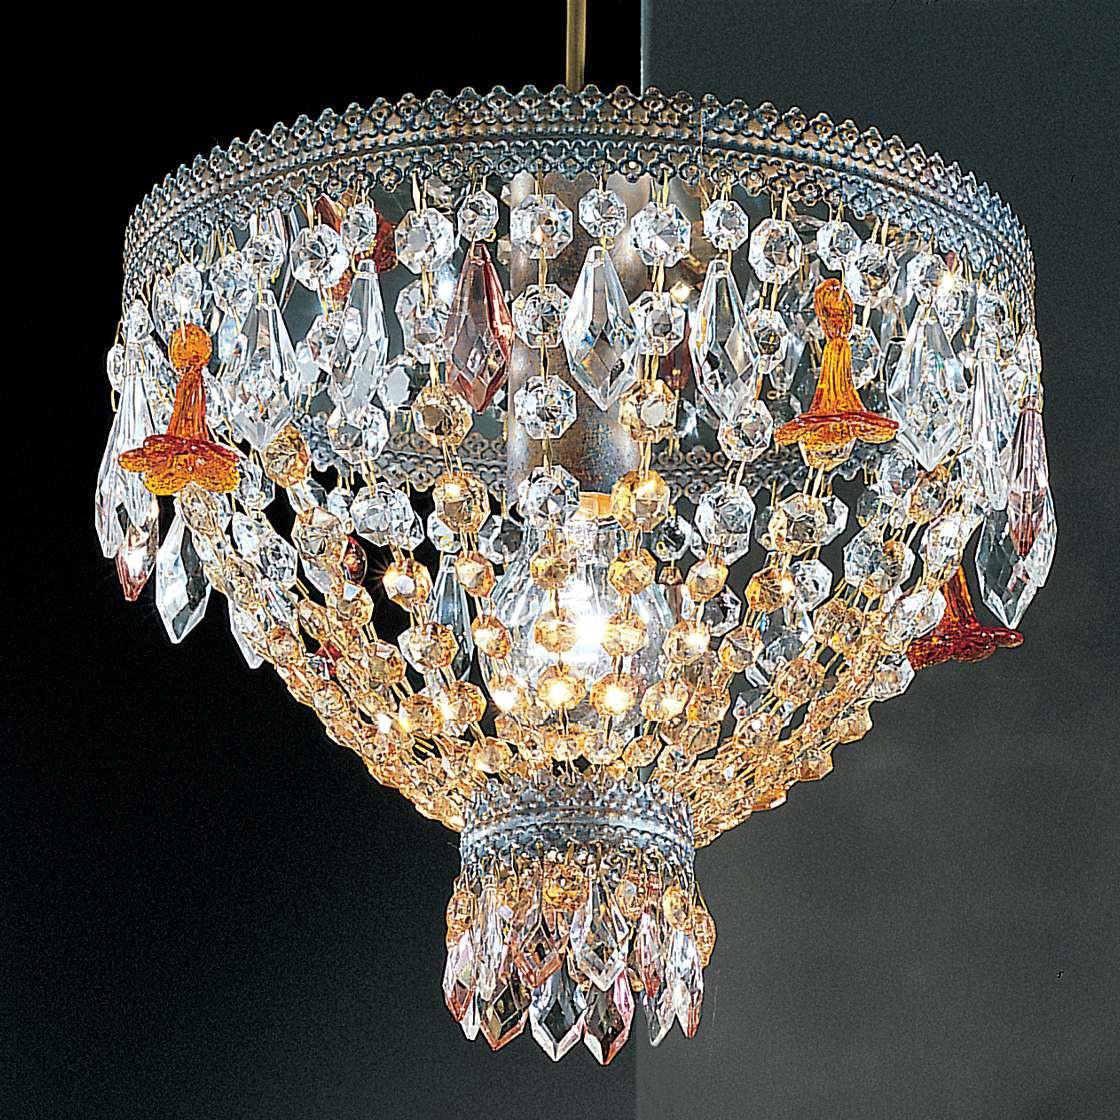 Kronleuchter Golden Dream ● Metall/Kristall ● Silberblau ● 1-flammig- Hans Kögl A+